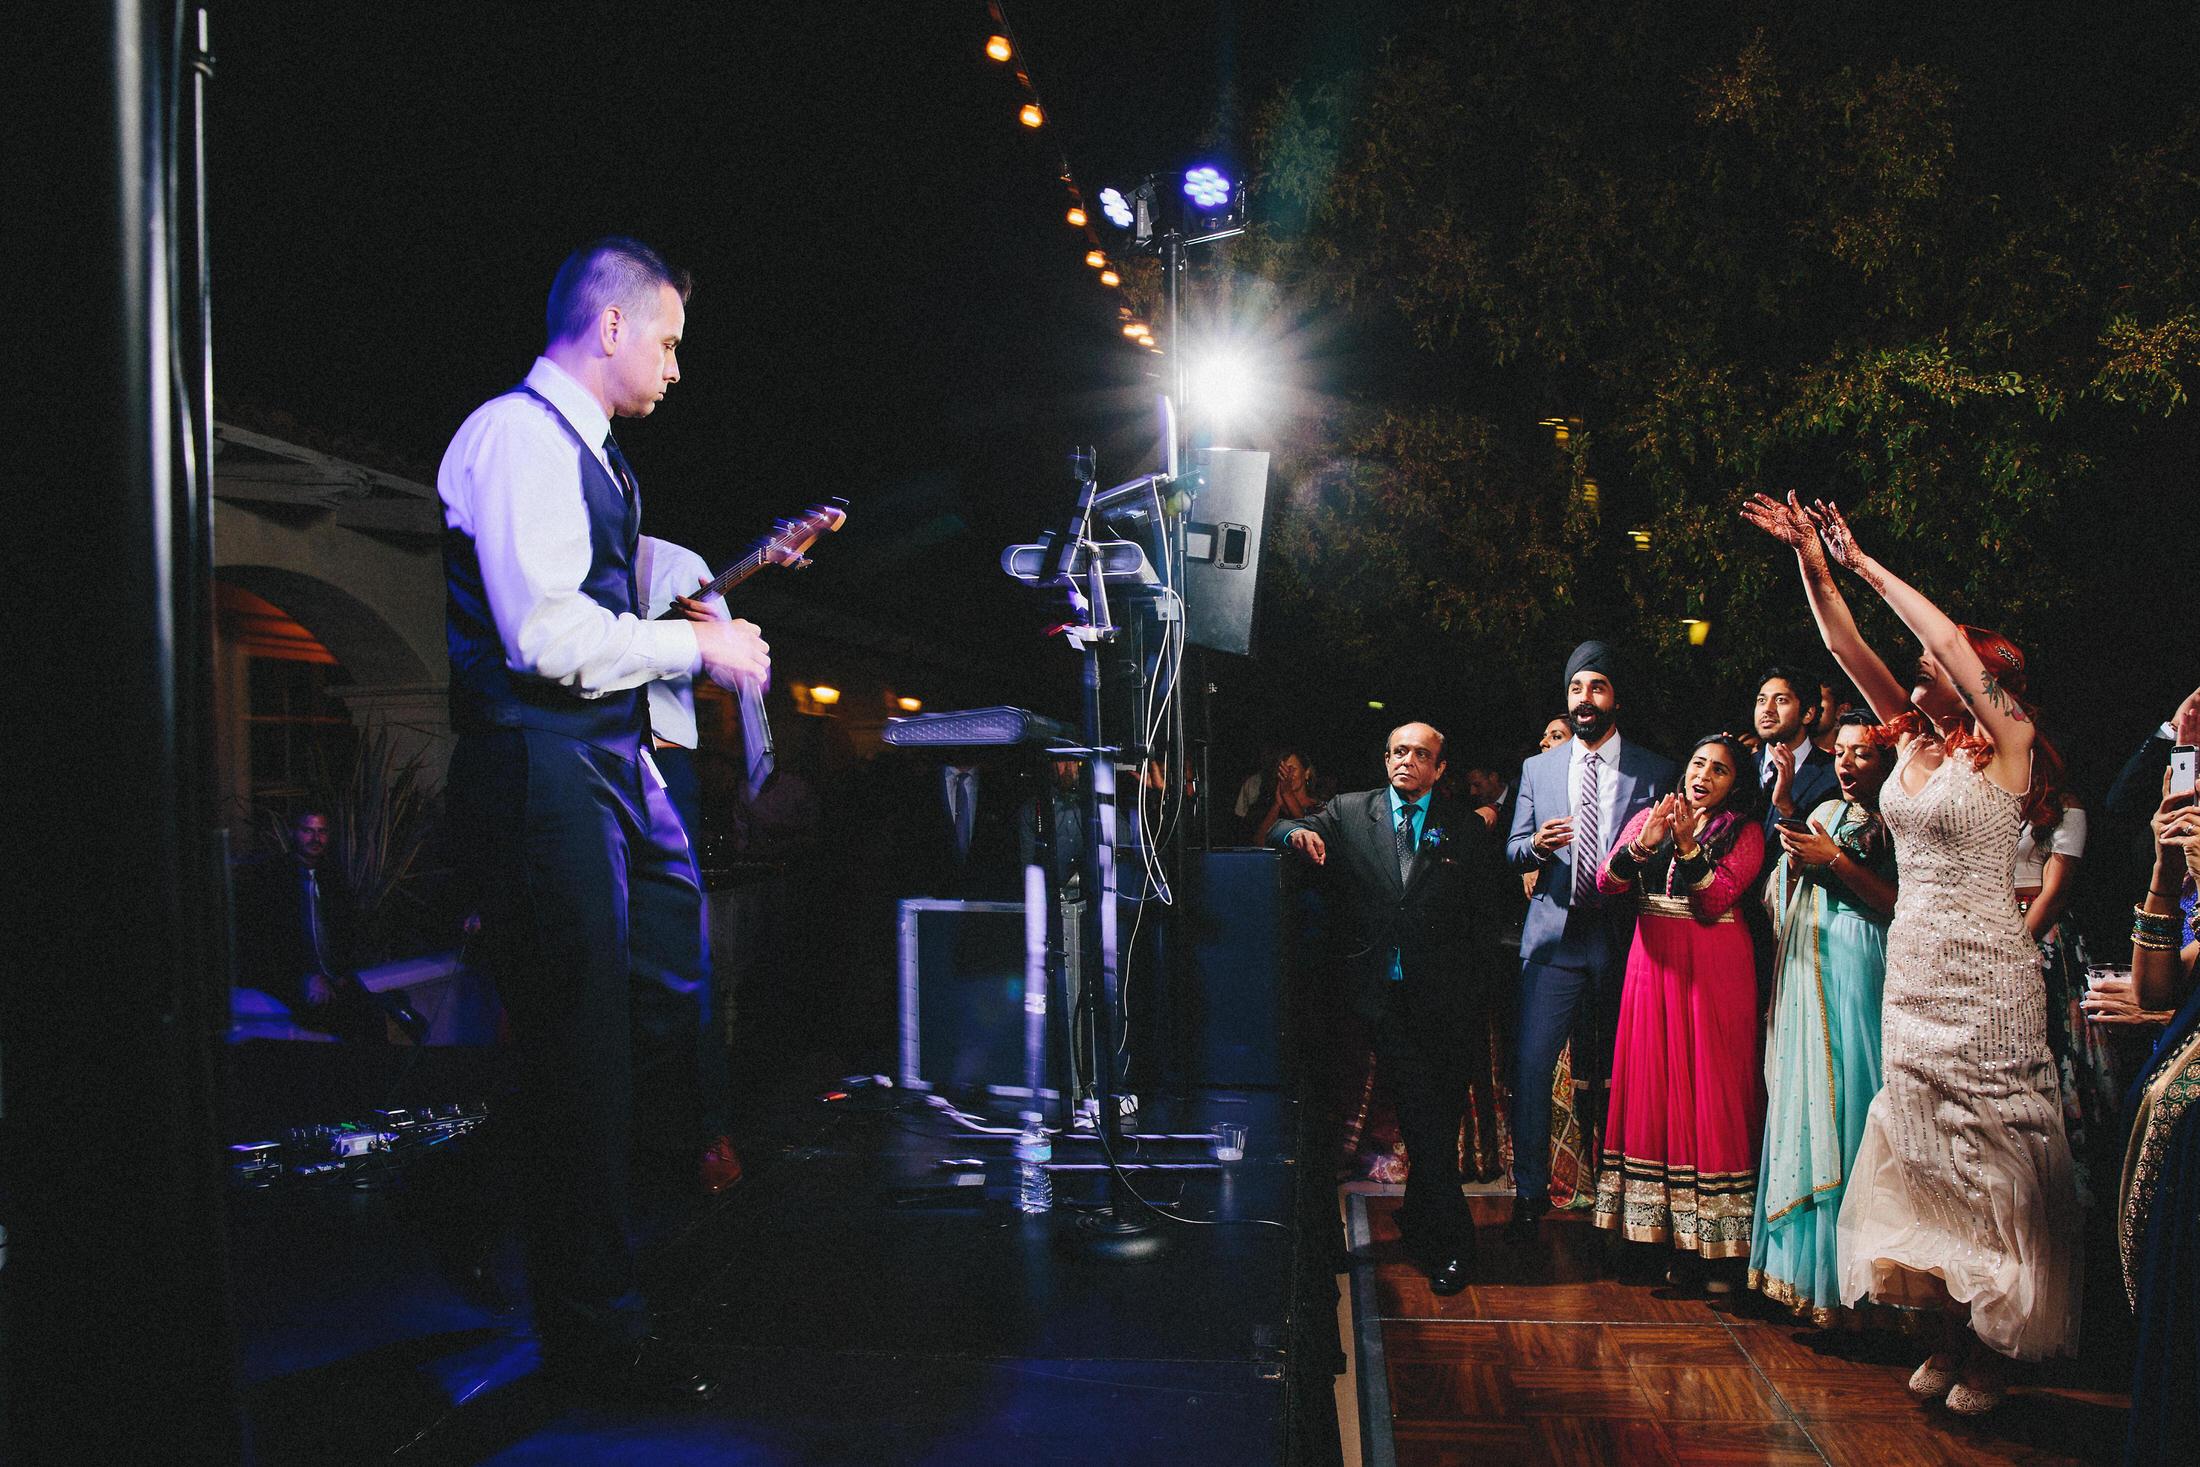 Modern-Indian-Serra-Plaza-wedding-108.jpg